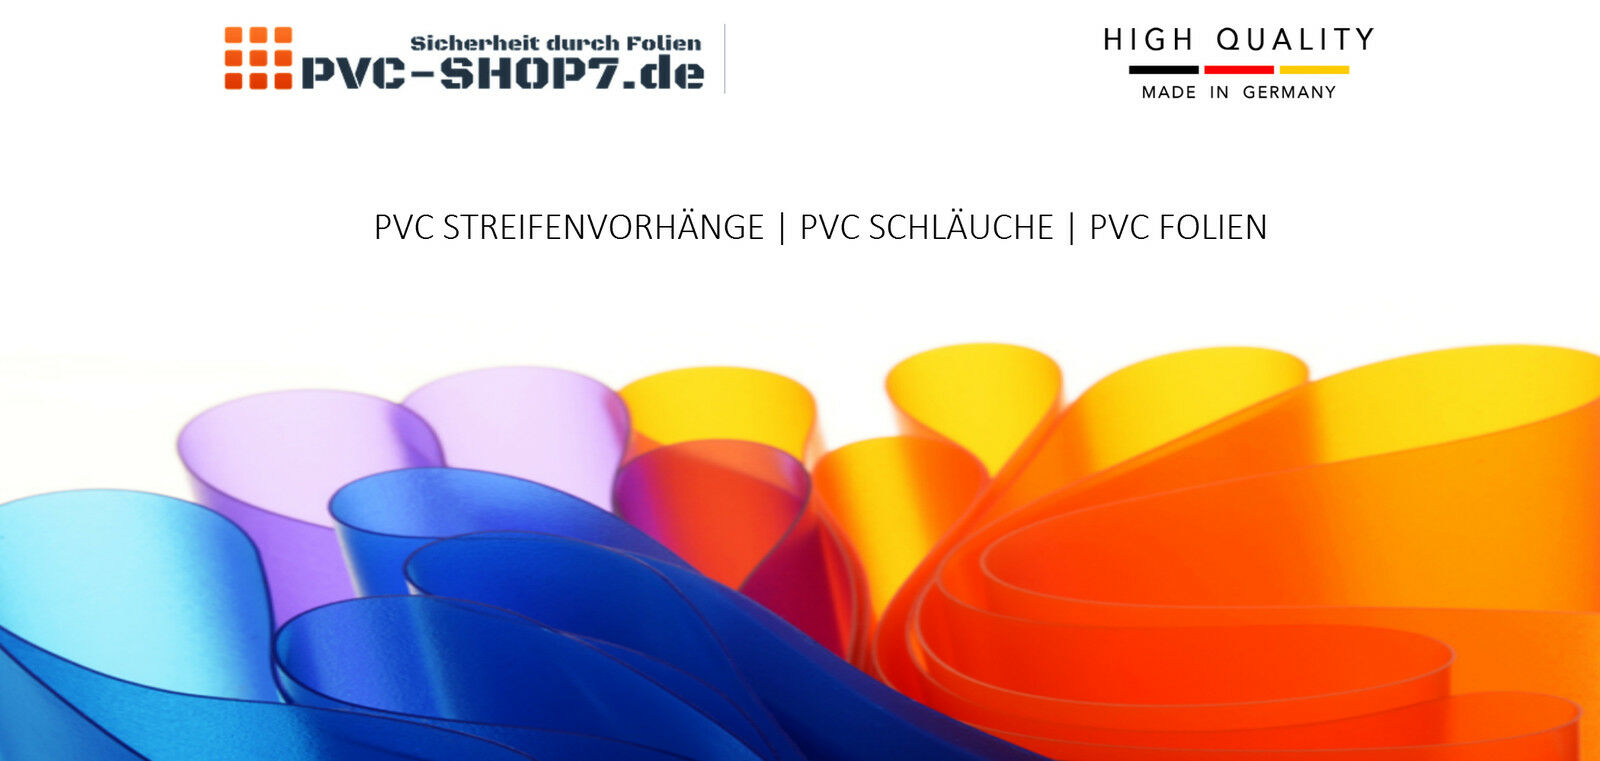 PVC-SHOP7.de